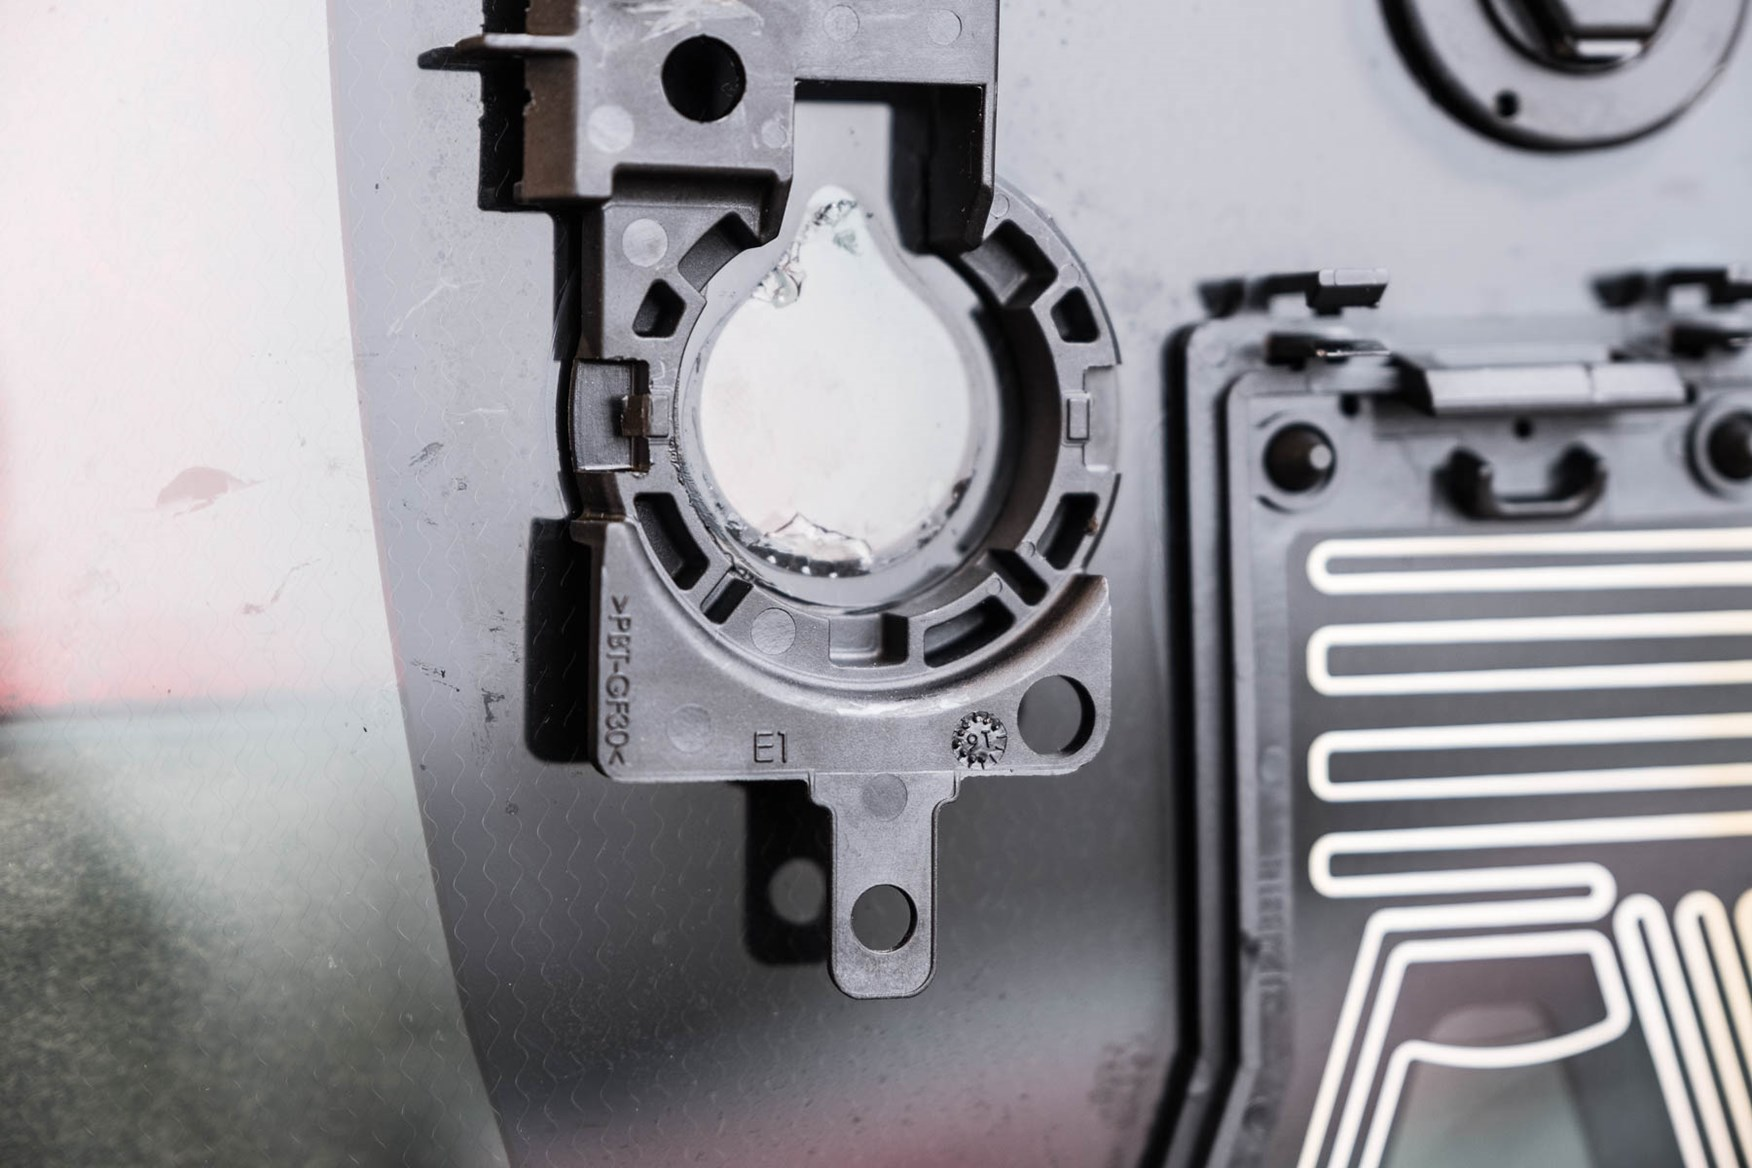 Residue on old sensor location